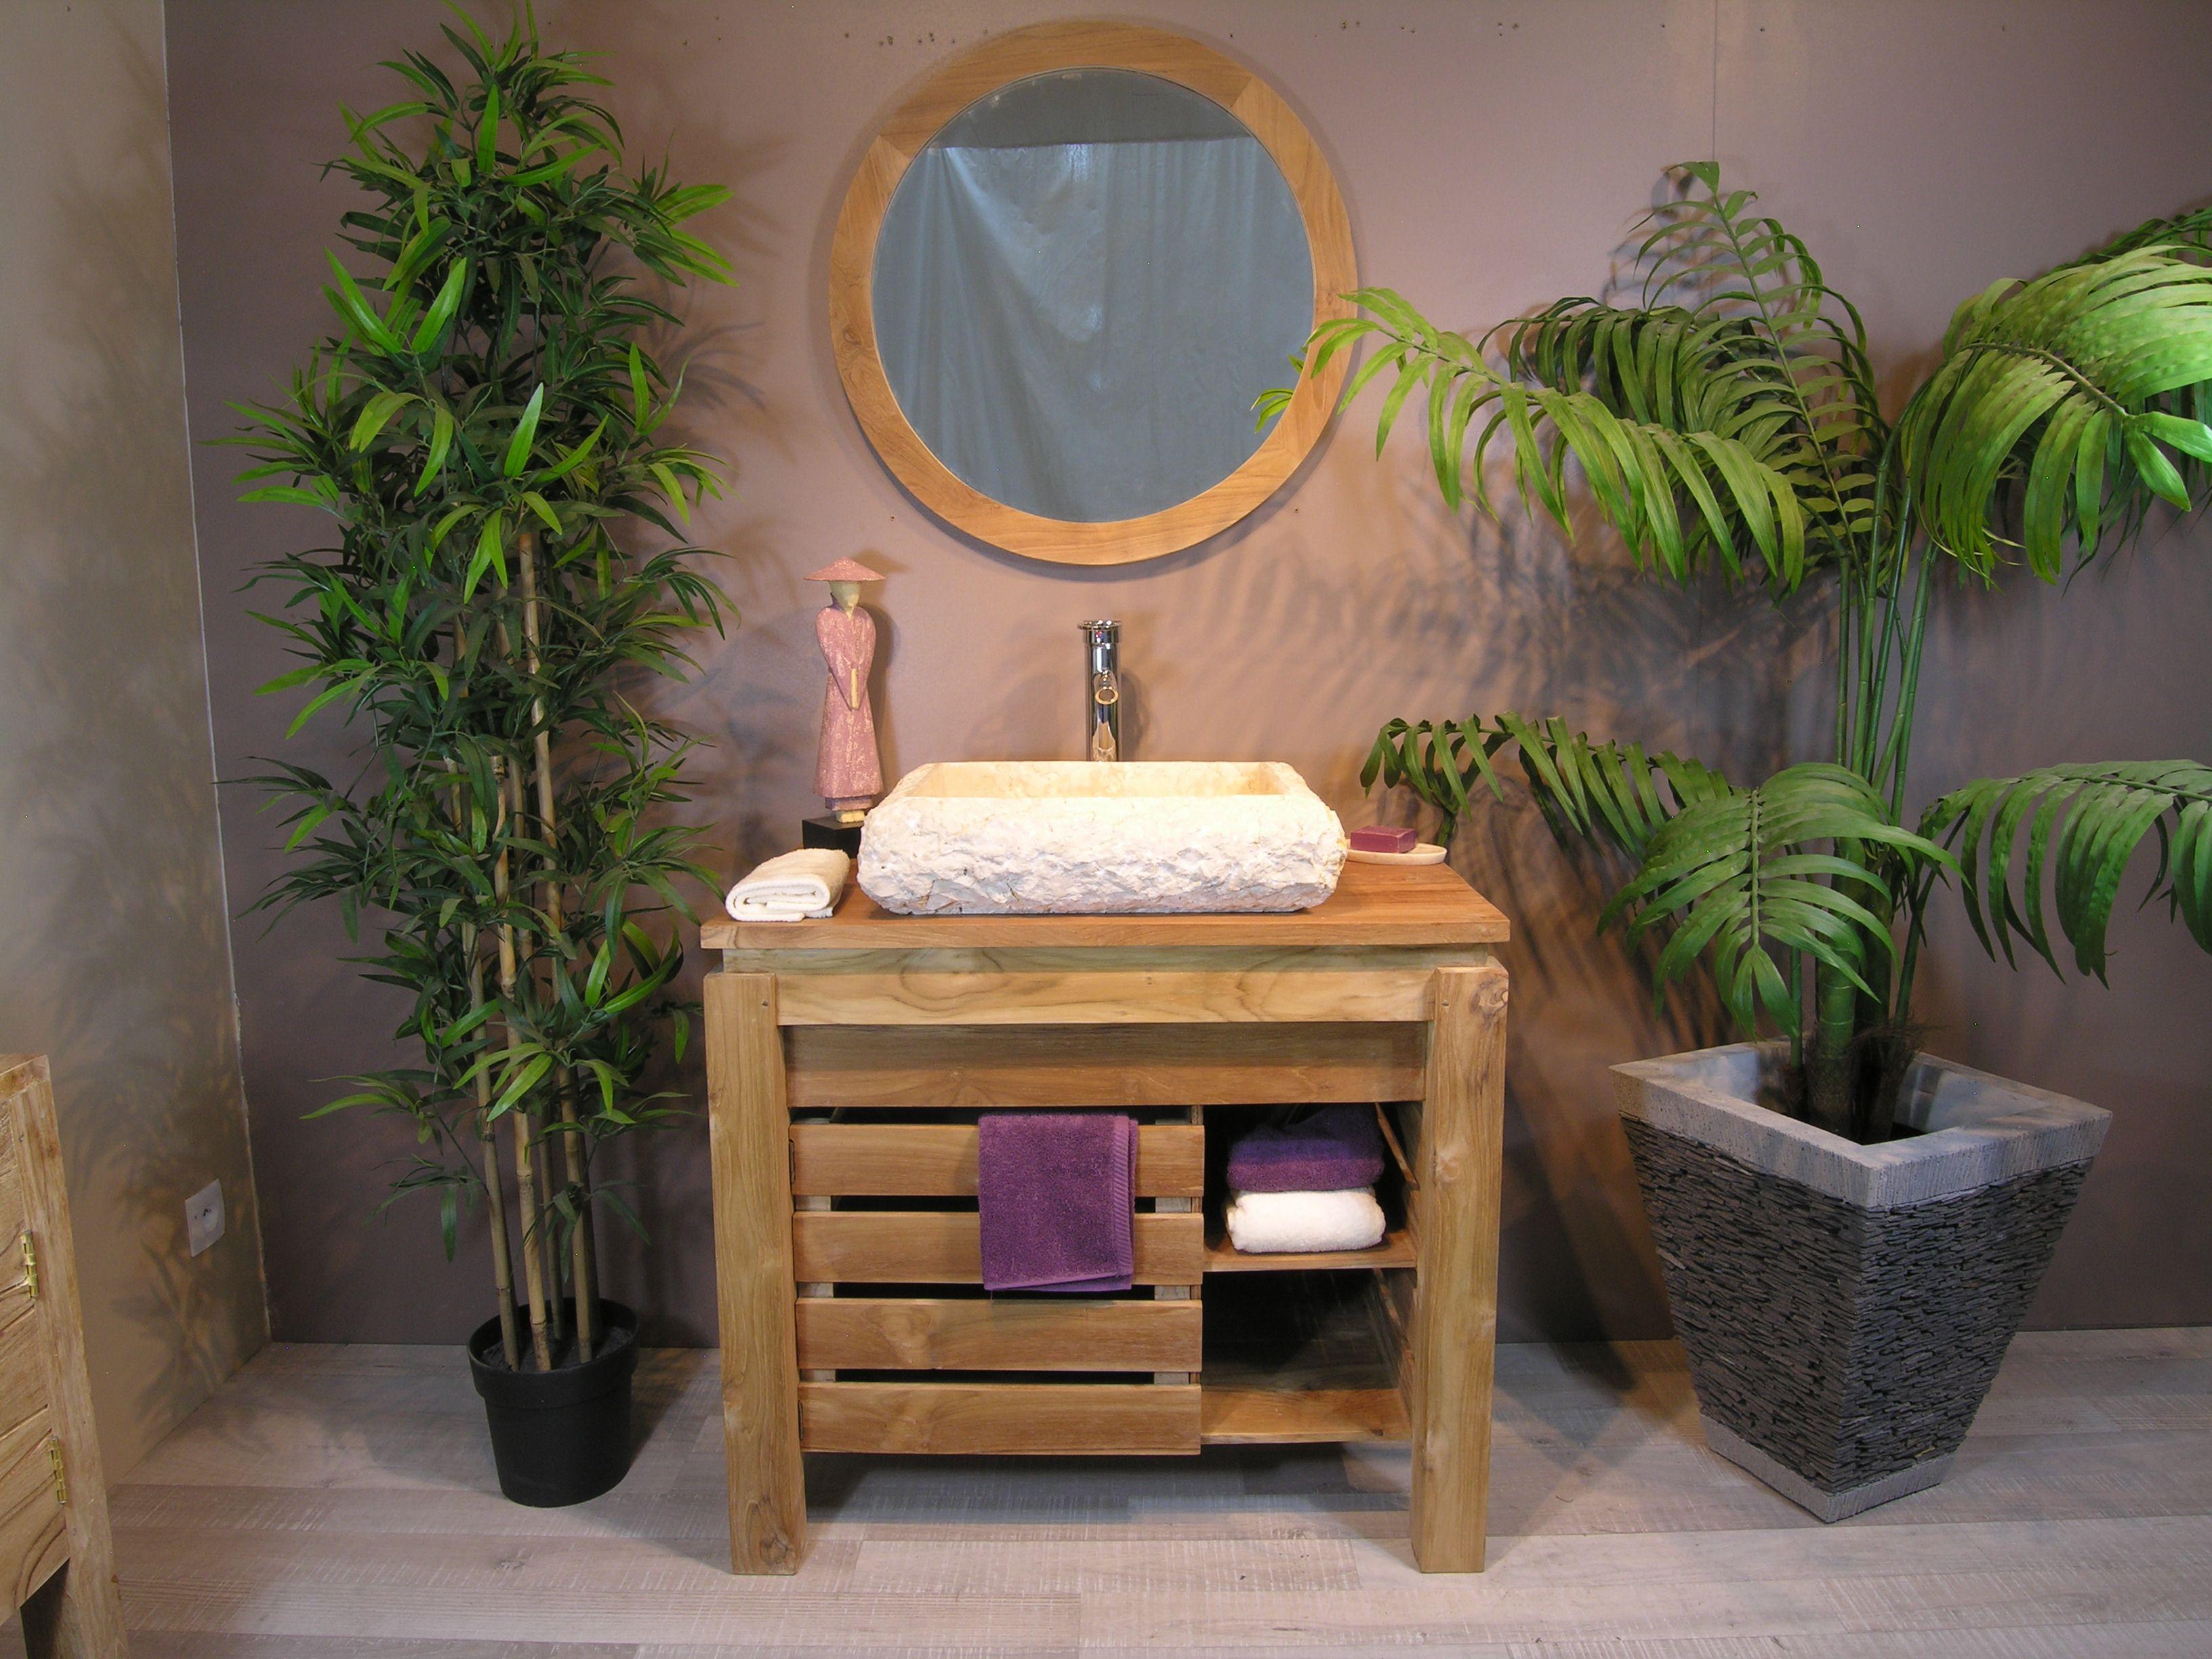 ori meuble de salle de bain en teck zen 85cm miroir 446 d co pinterest salle de bain en. Black Bedroom Furniture Sets. Home Design Ideas